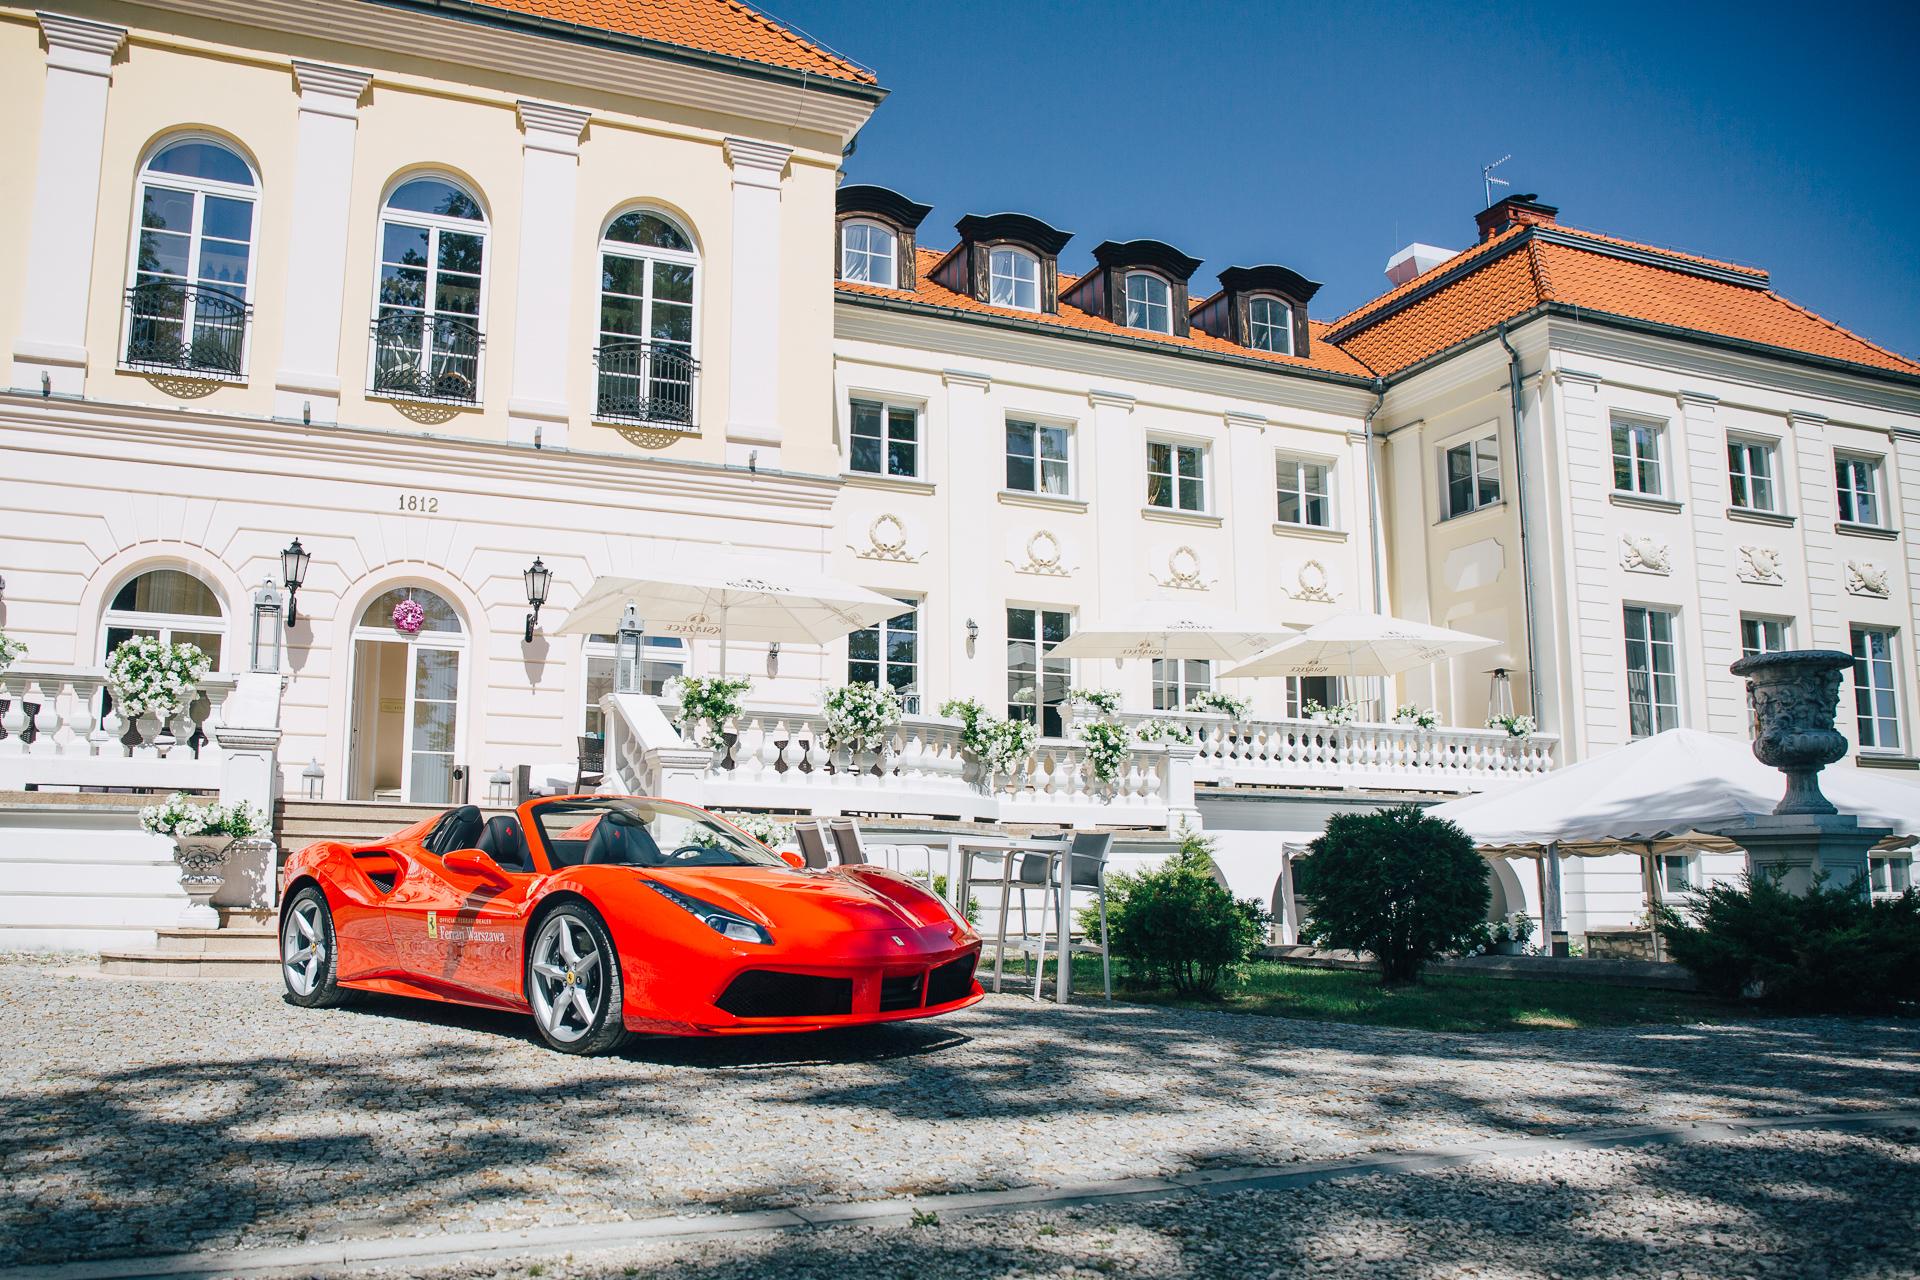 Forza Italia 2018 Ferrari 488 GTB Spider Pałac Alexandrinum